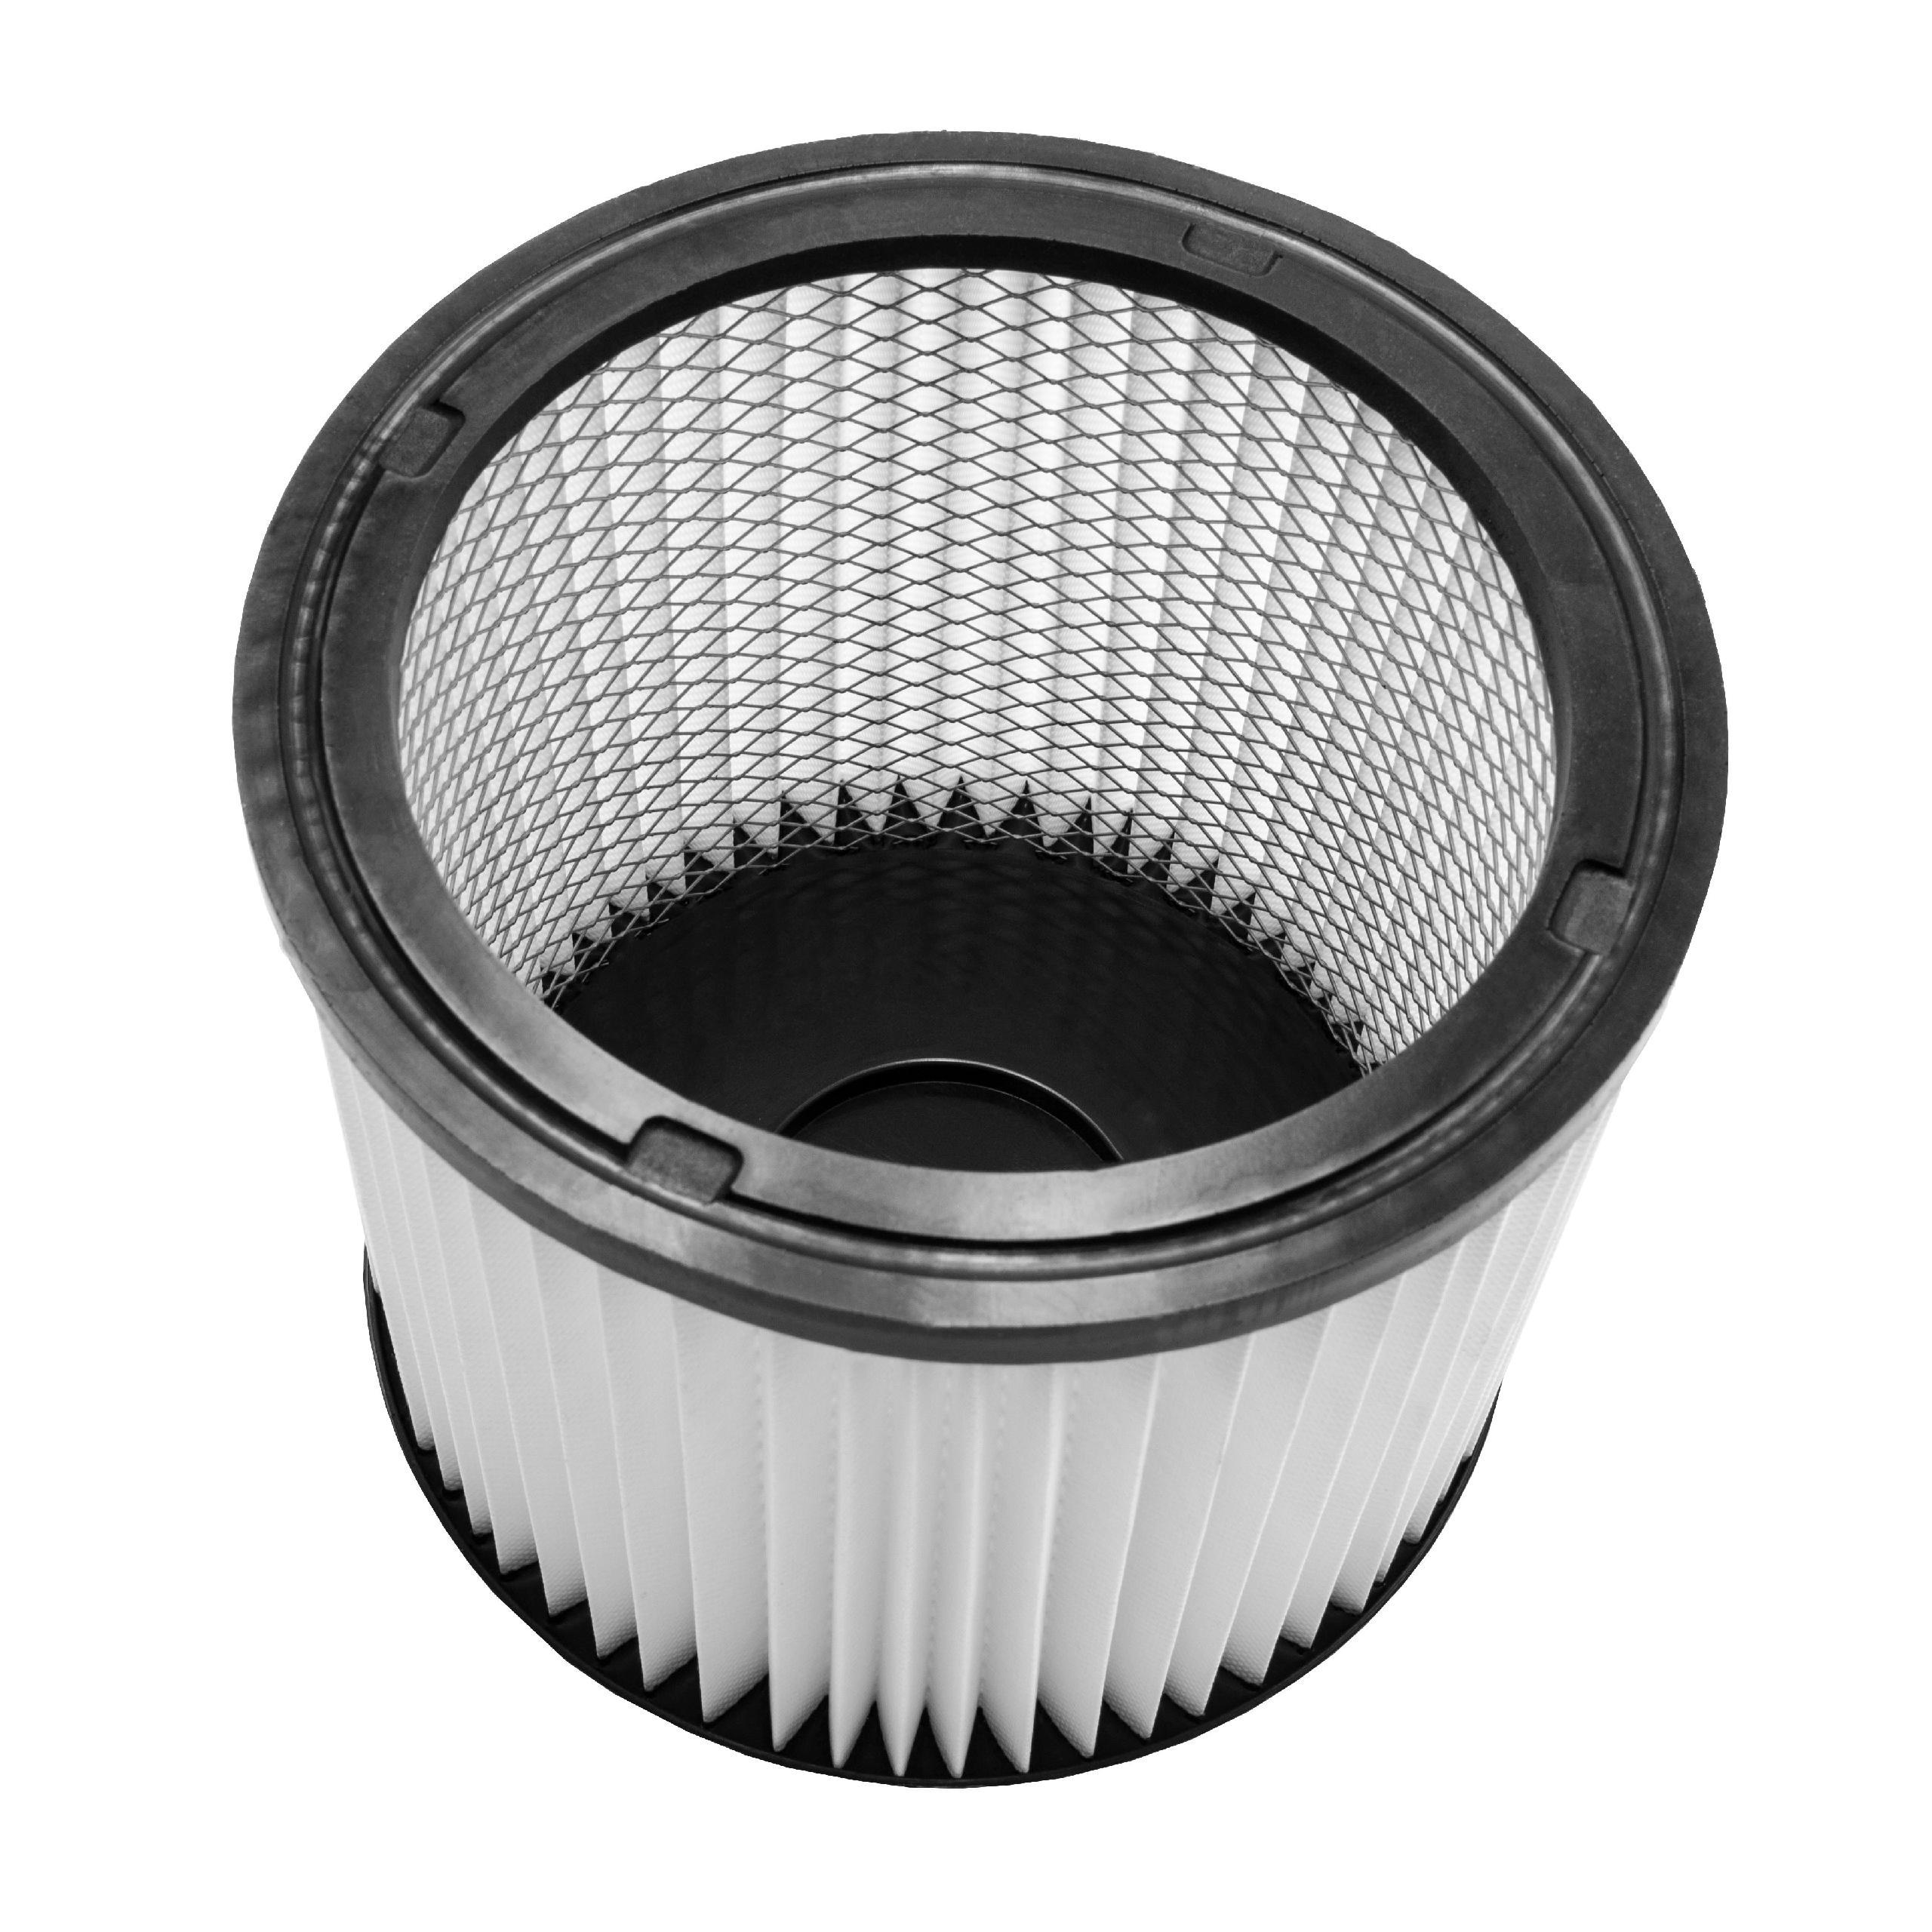 Lamellen Falten Rund Filter für Aqua Vac AZ 91951-10,Max 630,Plus 1001